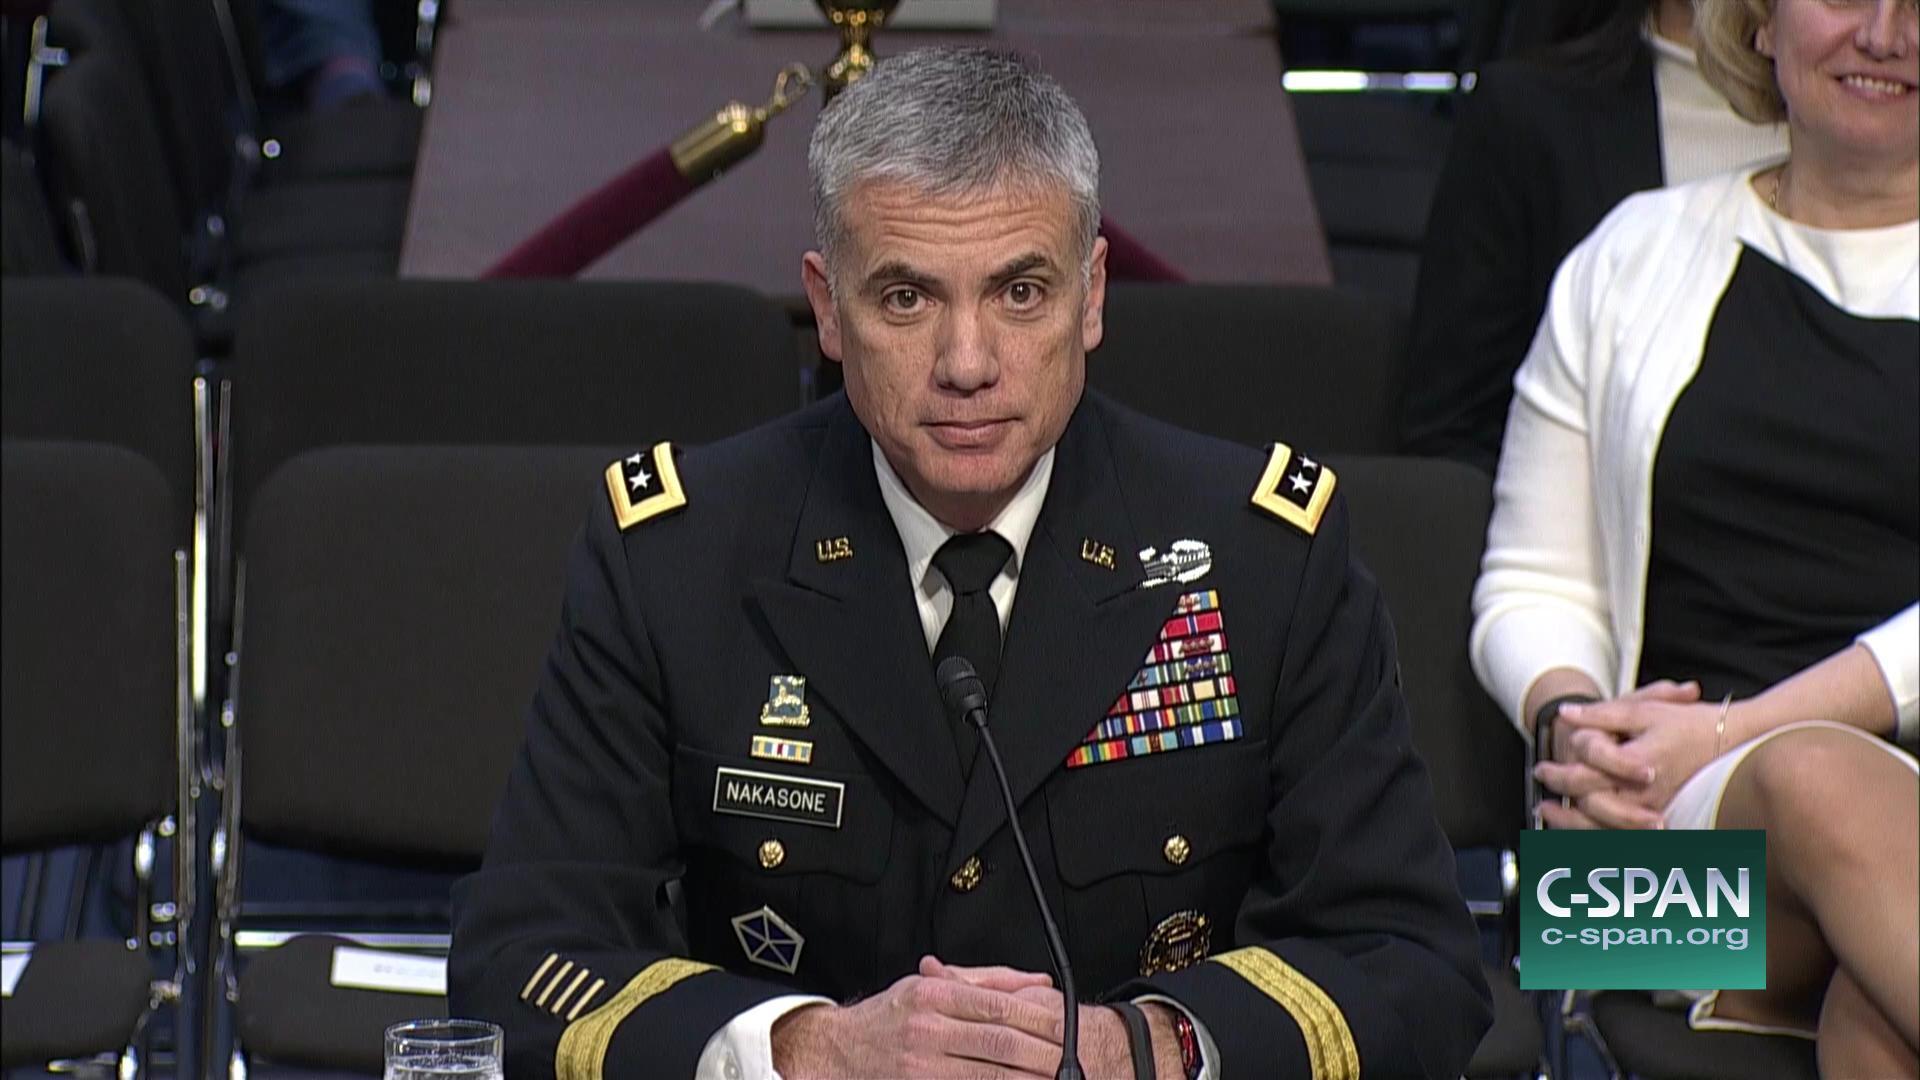 Nsa Nominee Lieutenant General Paul Nakasone Testifies Confirmation Caig Conductive Circuitwriter Pen Amazoncouk Electronics Hearing